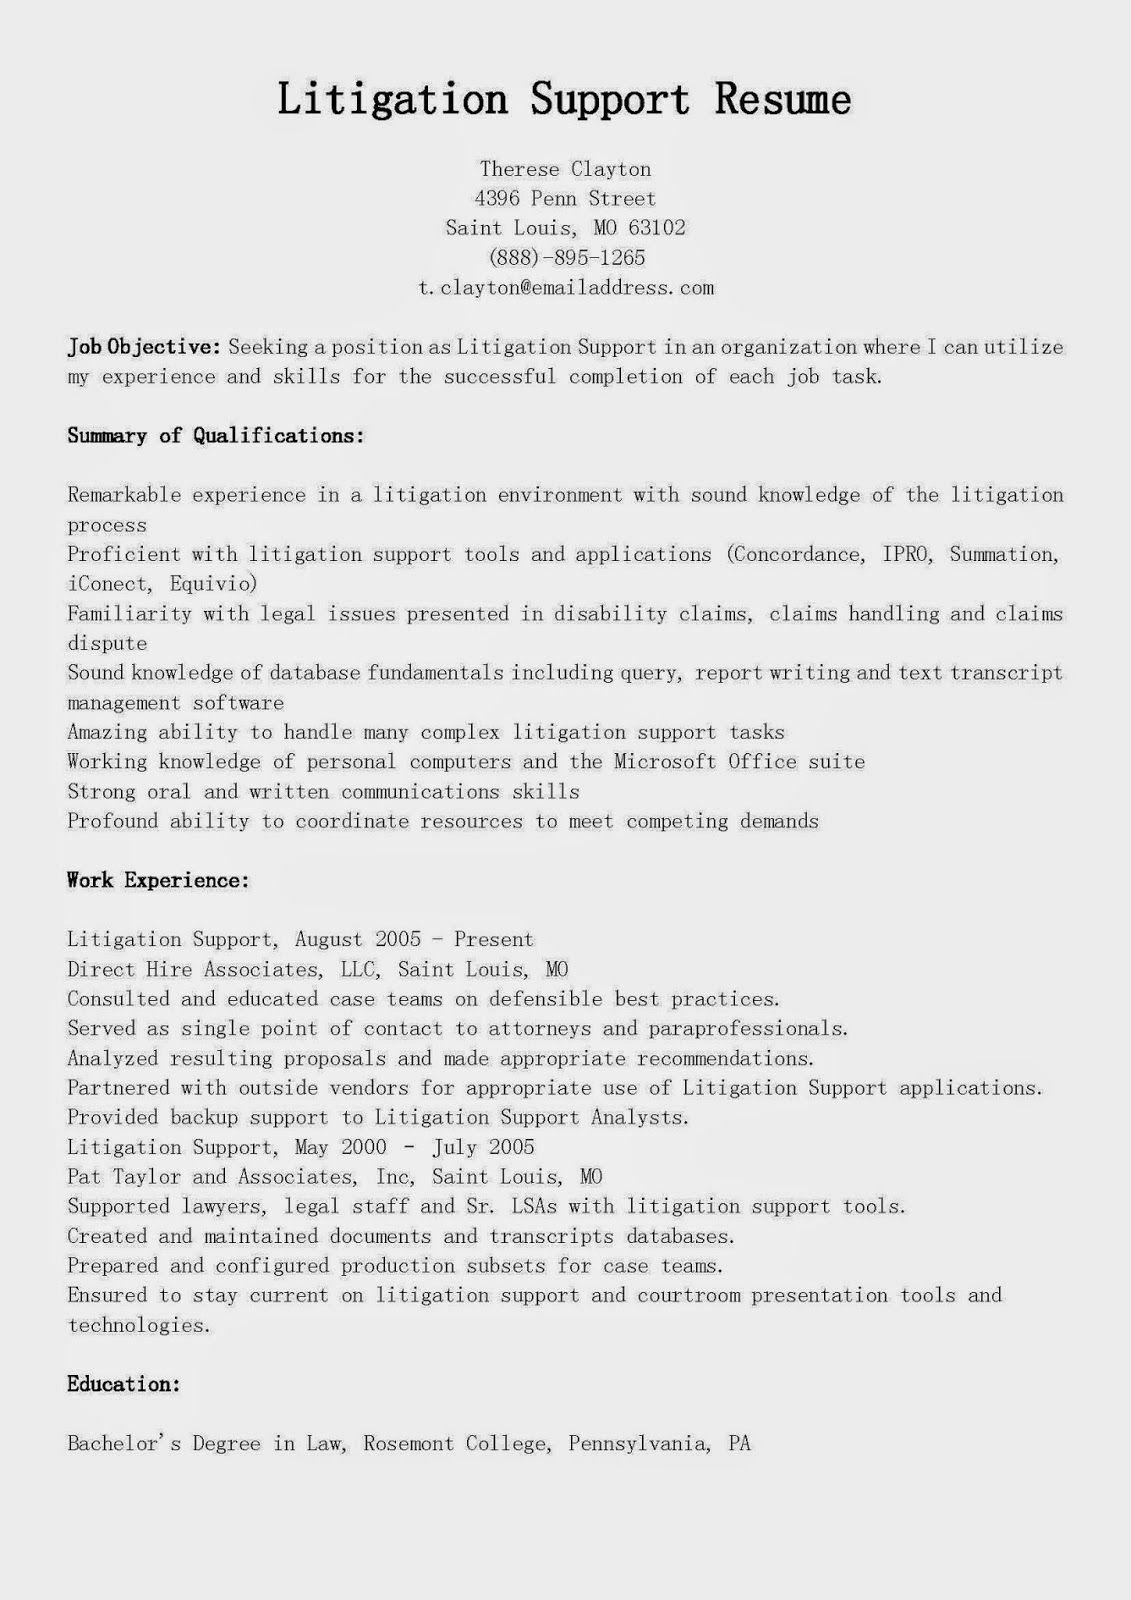 Litigation Support Resume Sample | Places to Visit | Pinterest ...